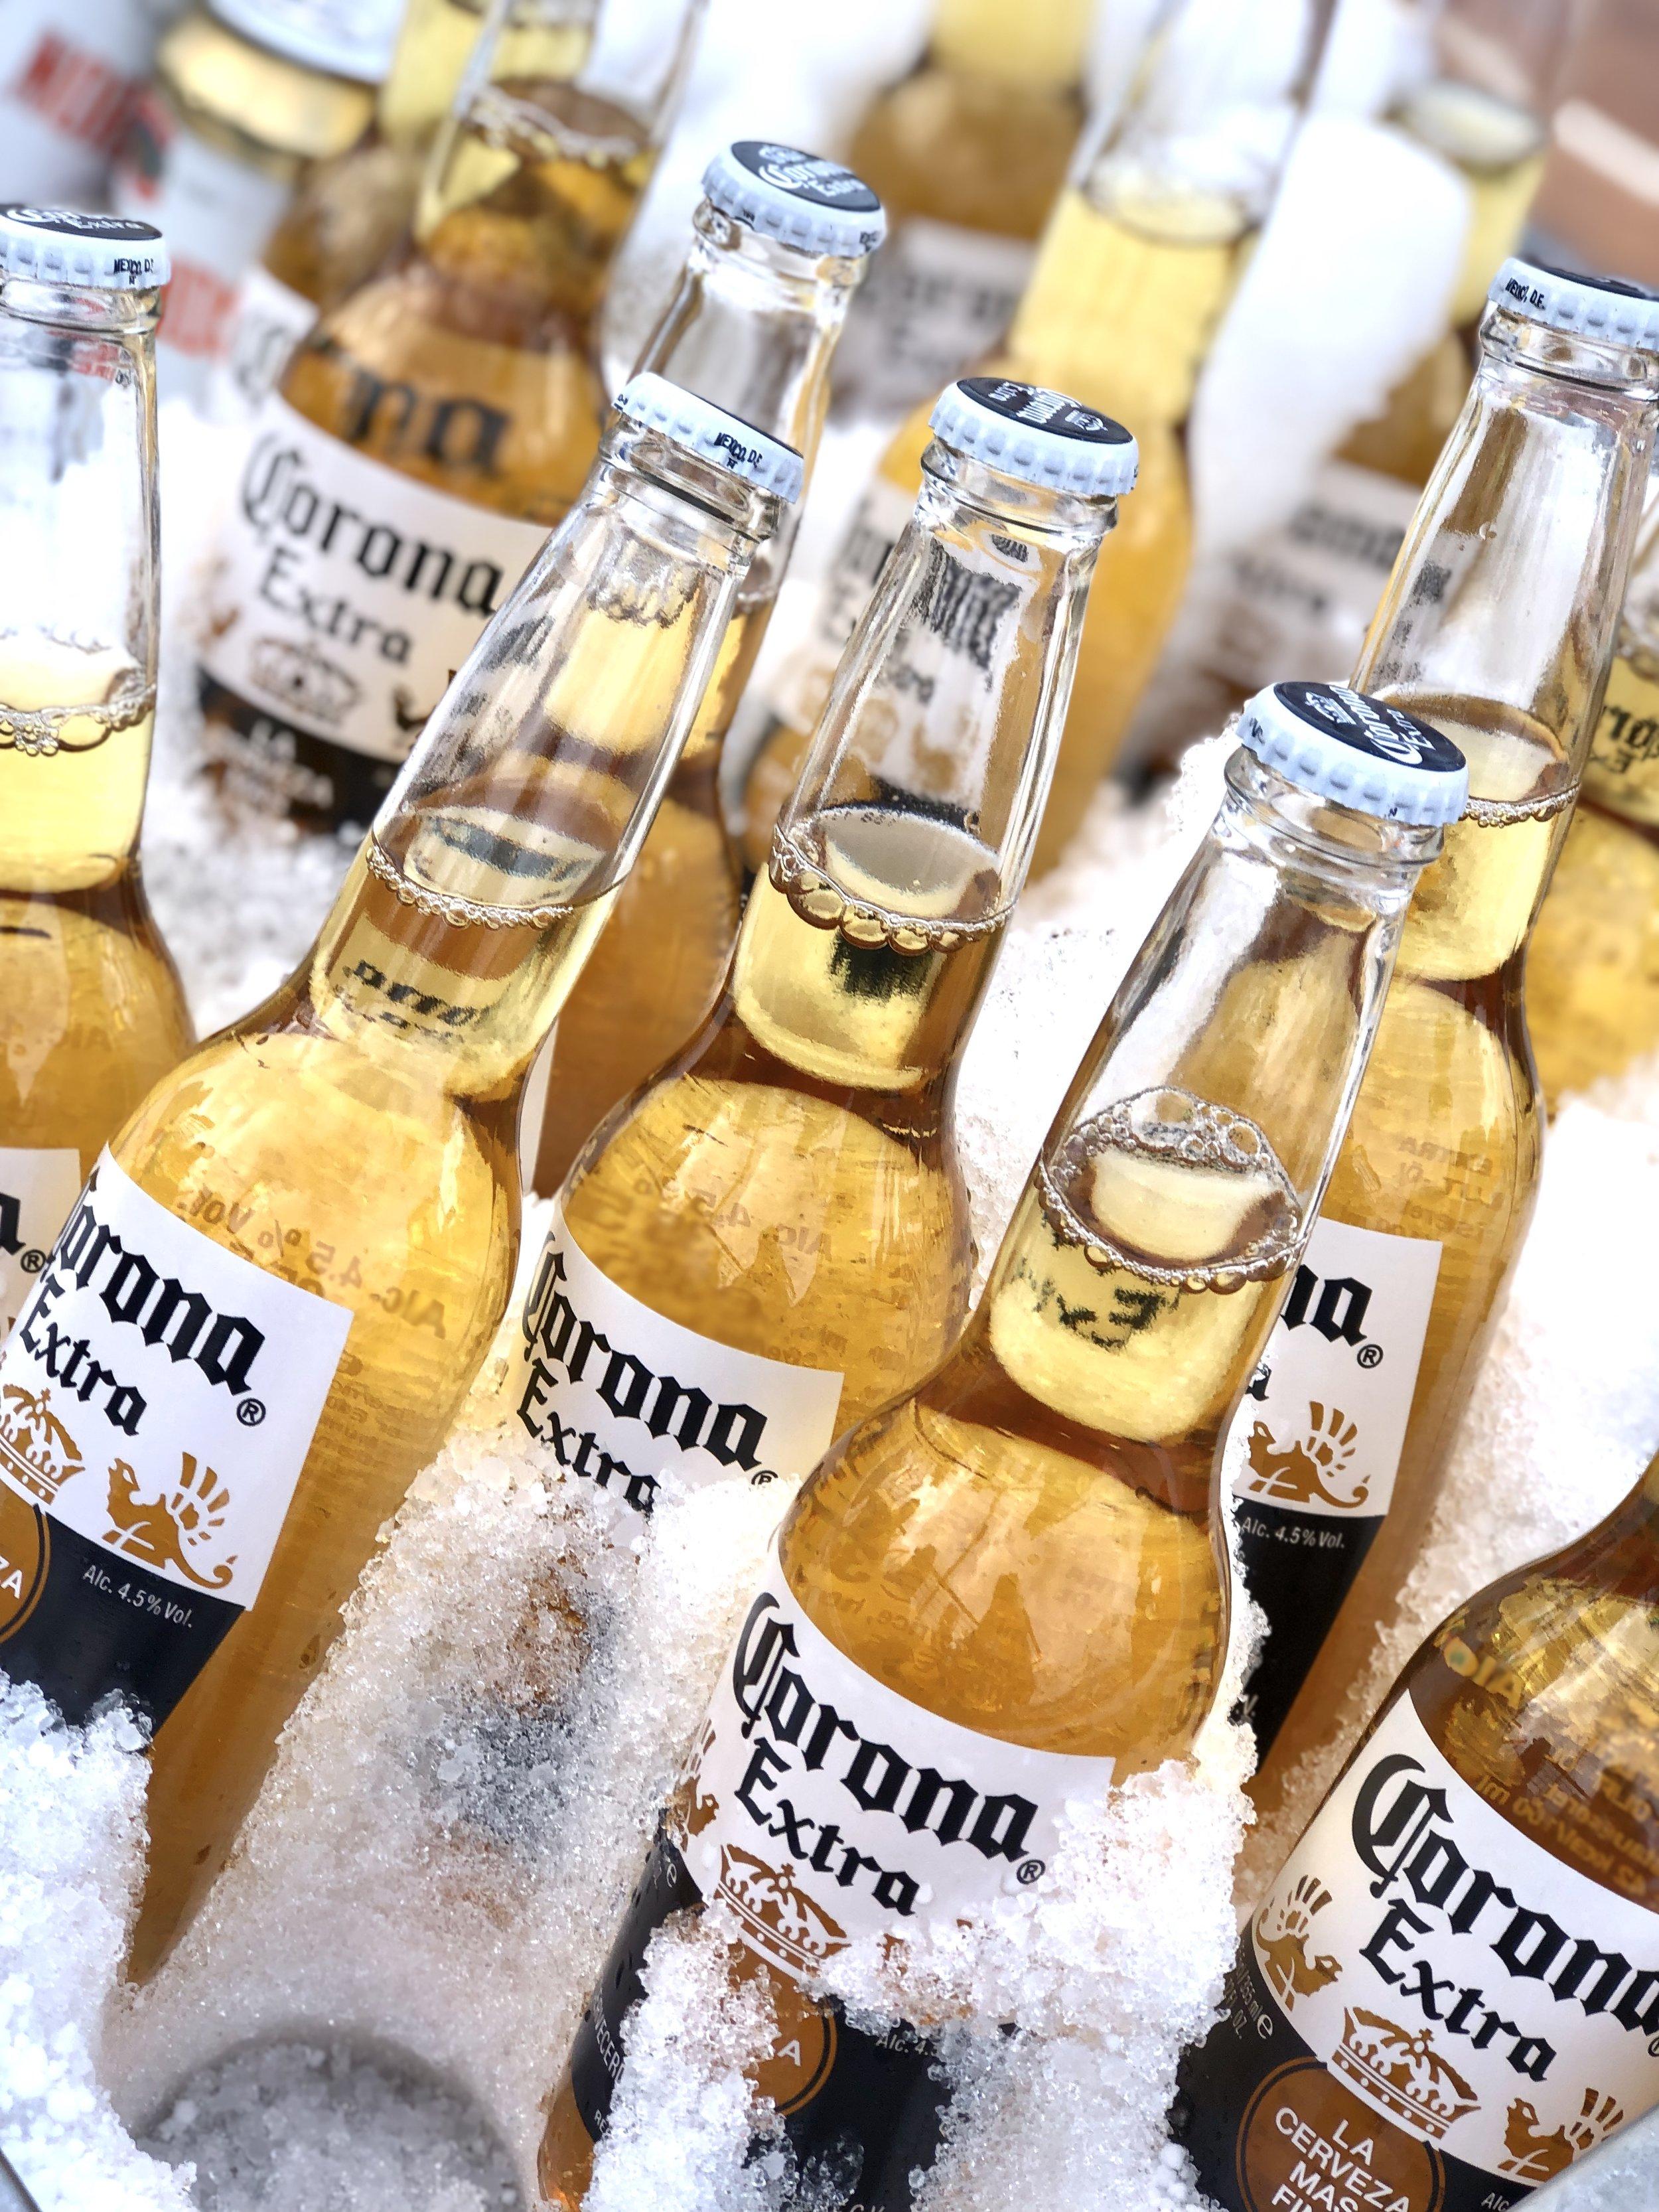 Kald Corona sto klart på dekk 🍻